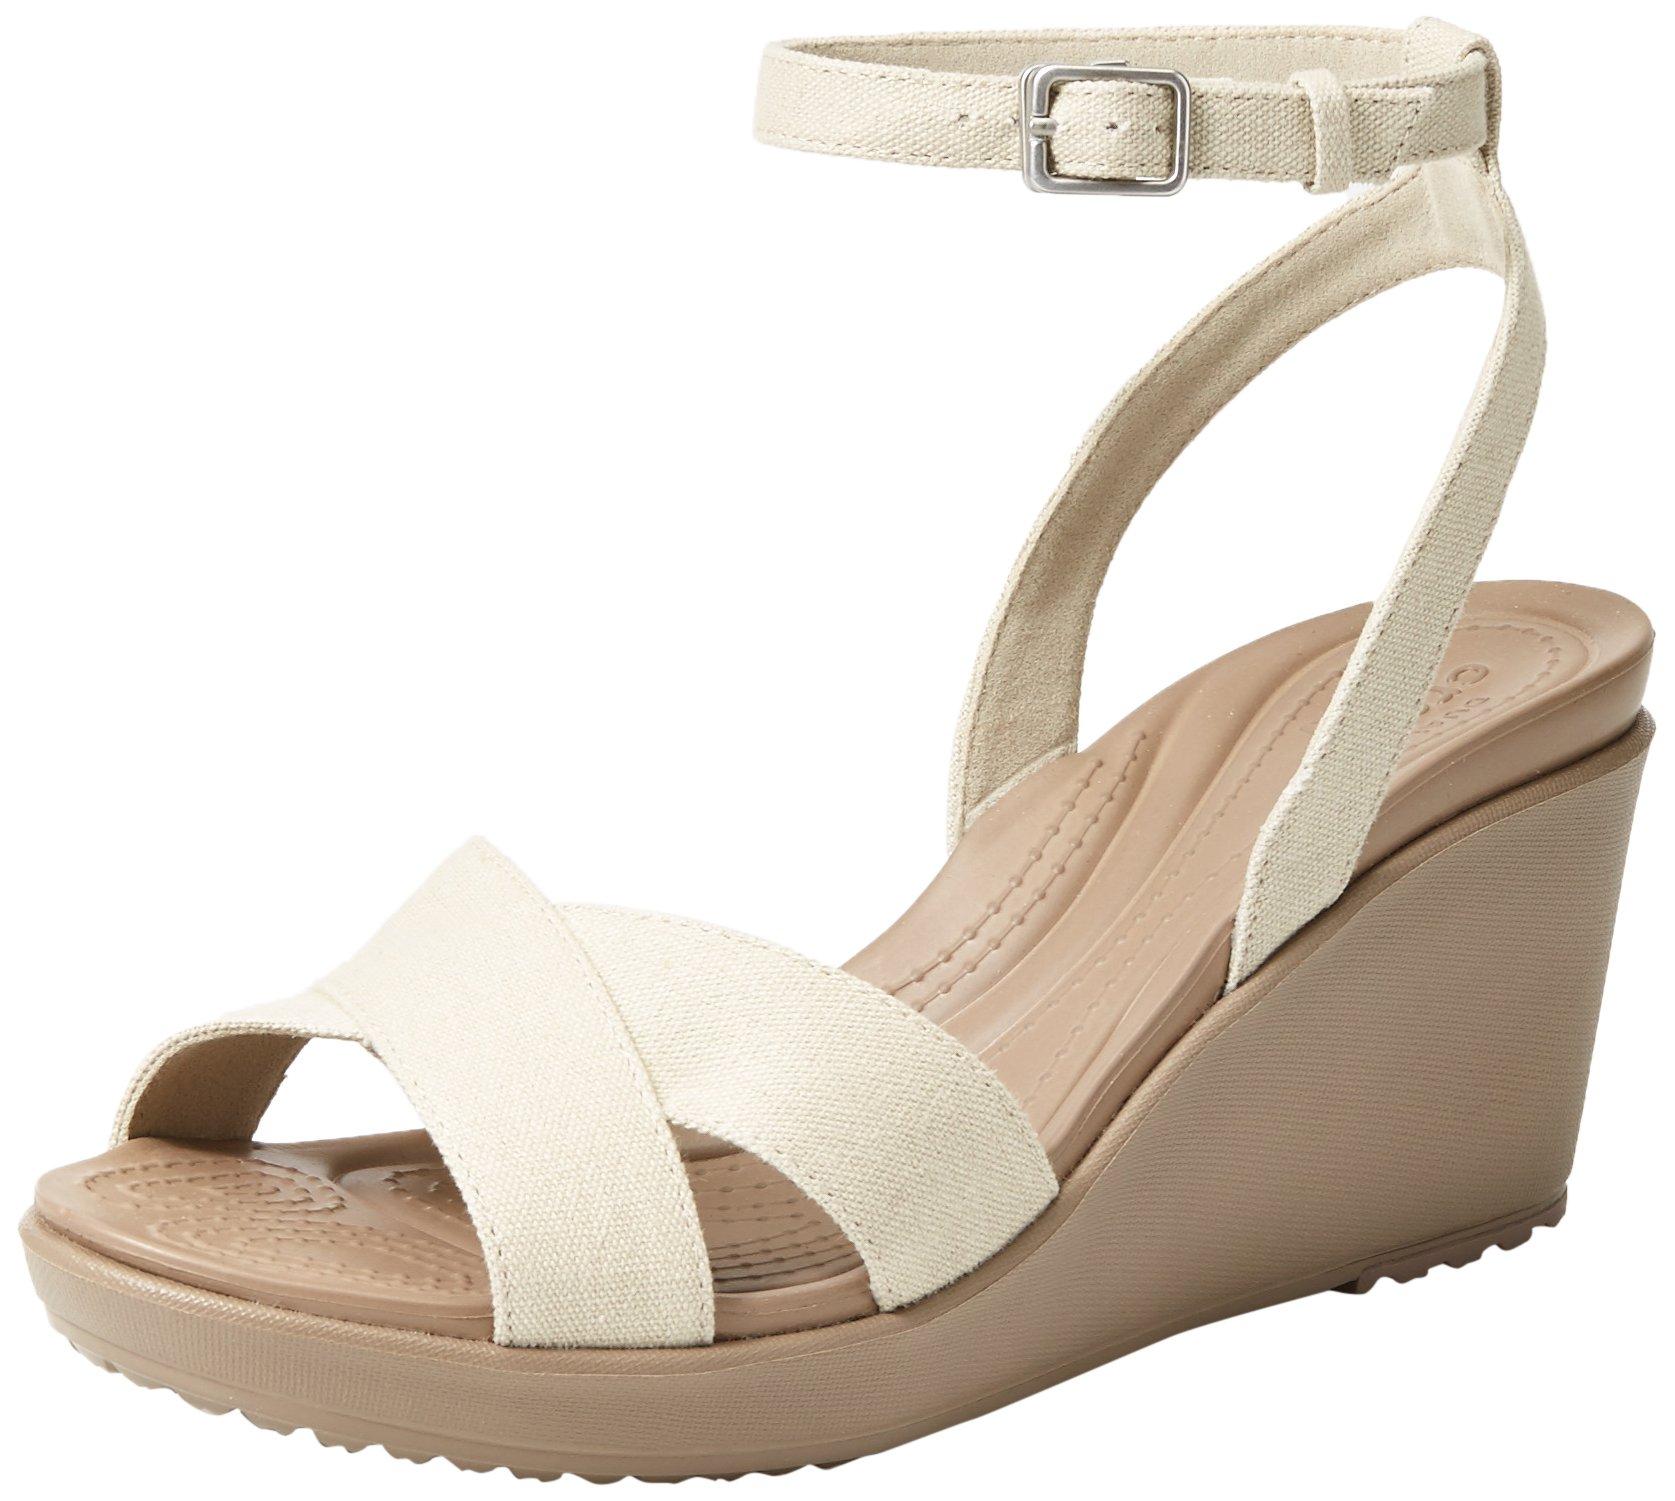 Crocs Women's Leigh II Ankle Strap Wedge W Sandal, Oatmeal/Mushroom, 8 M US by Crocs